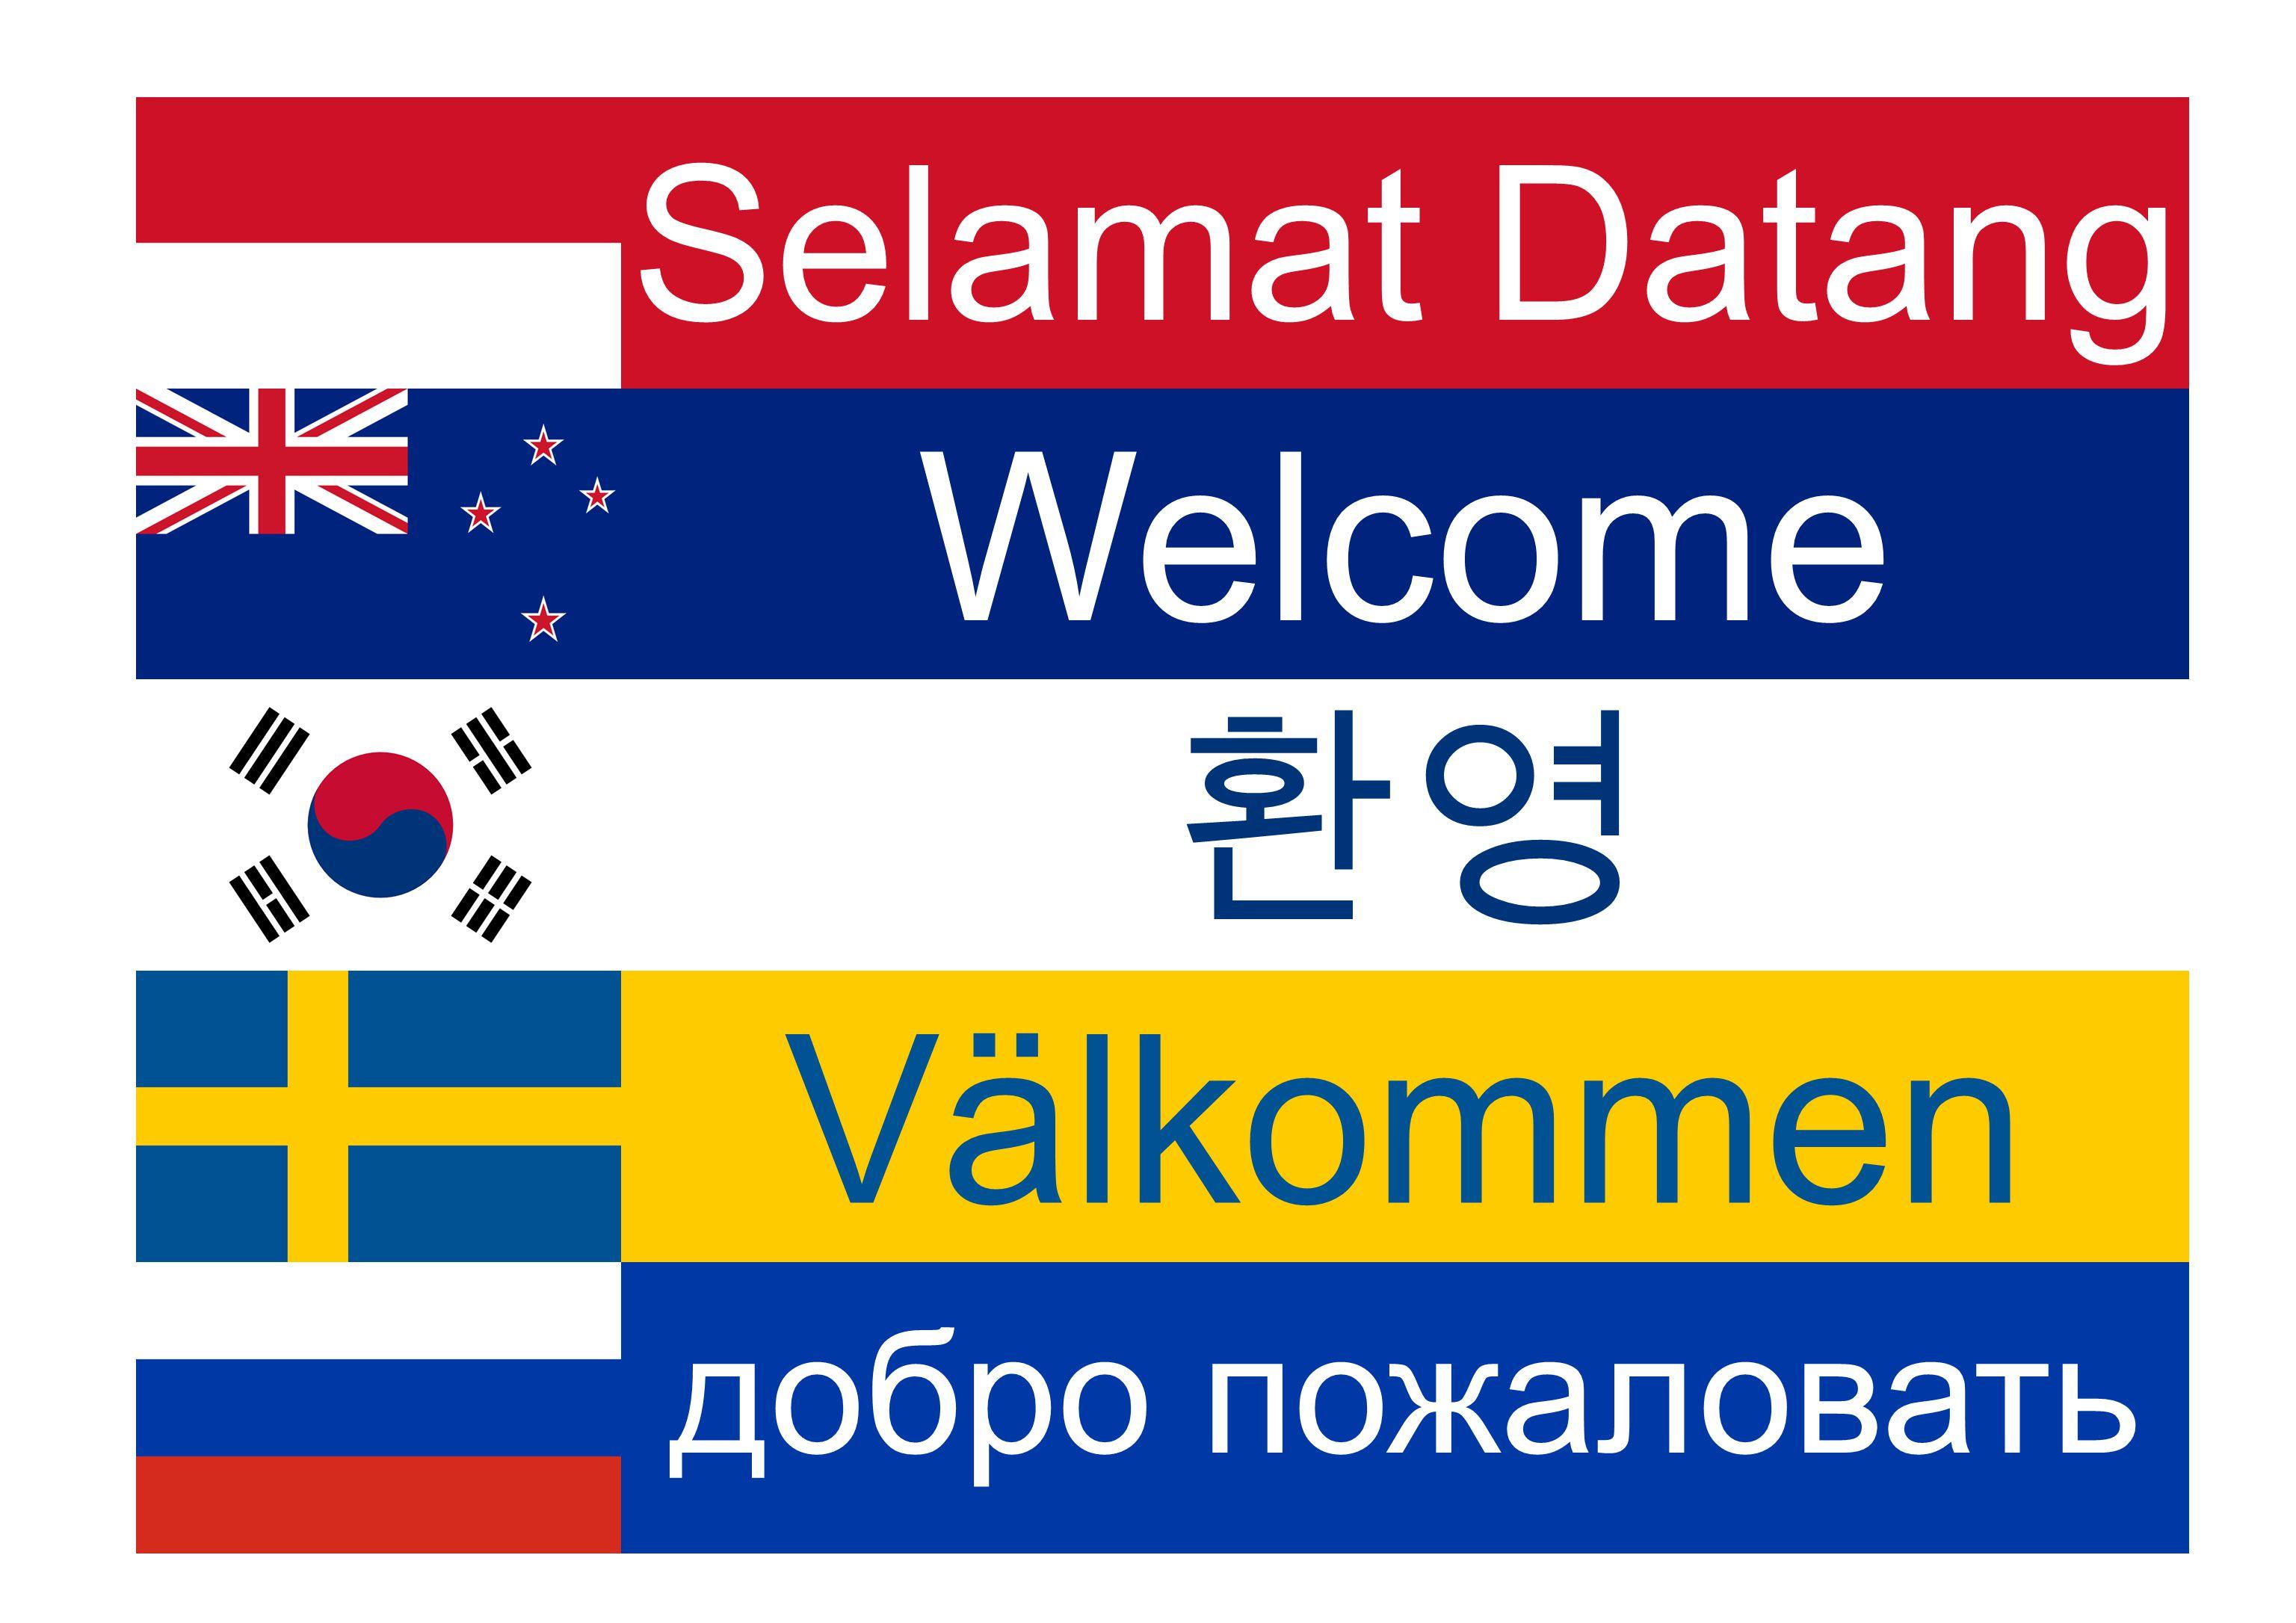 Selamat Datang Welcome 환영 Välkommen добро пожаловать